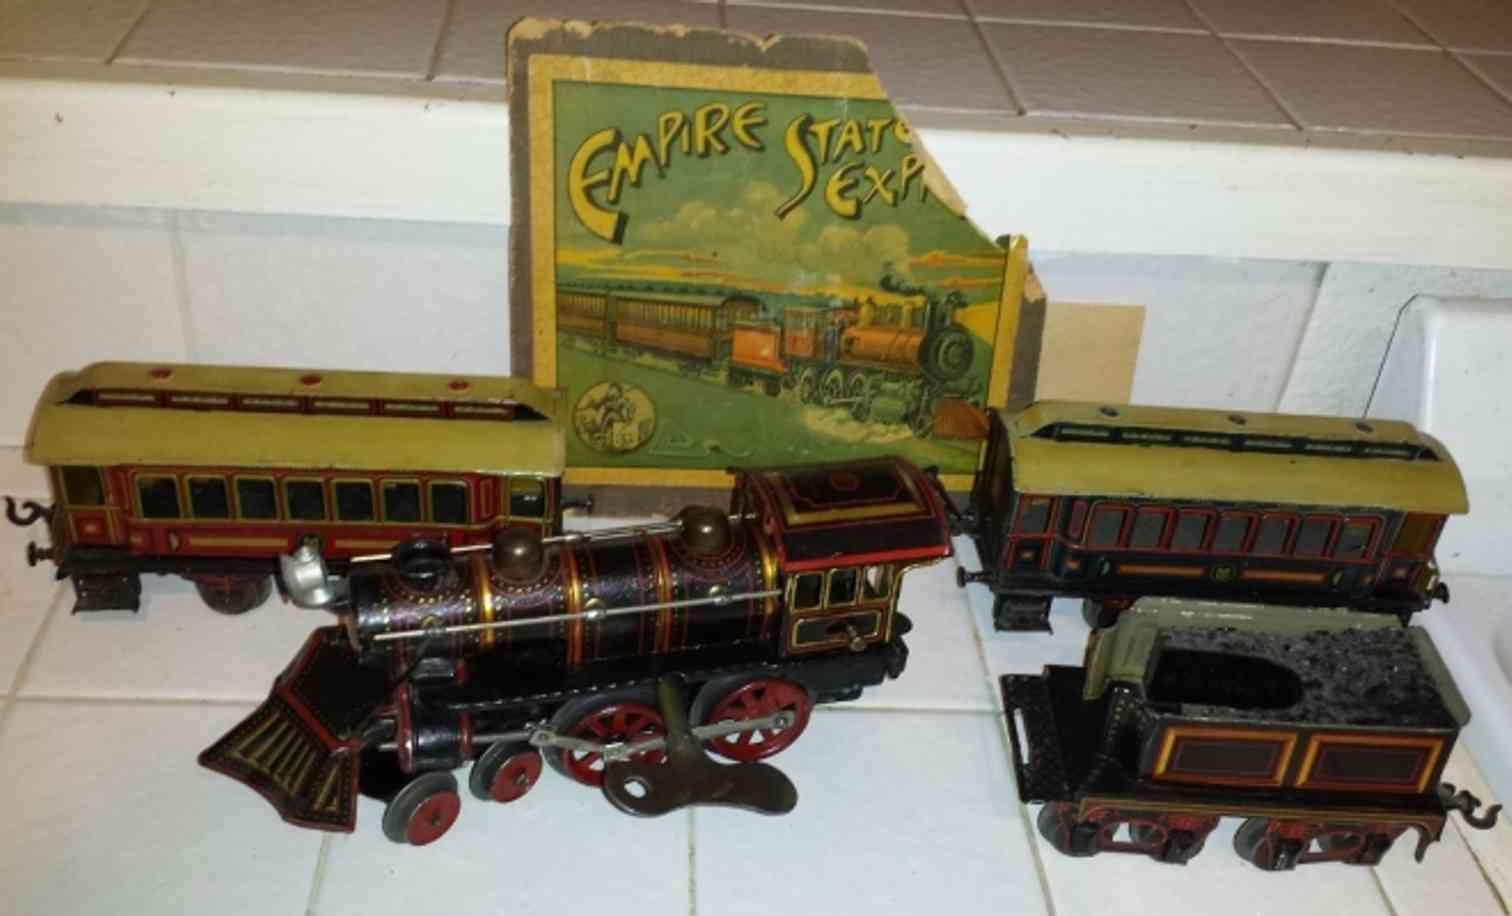 guenthermann railway toy american passenger train empire state express gauge 0